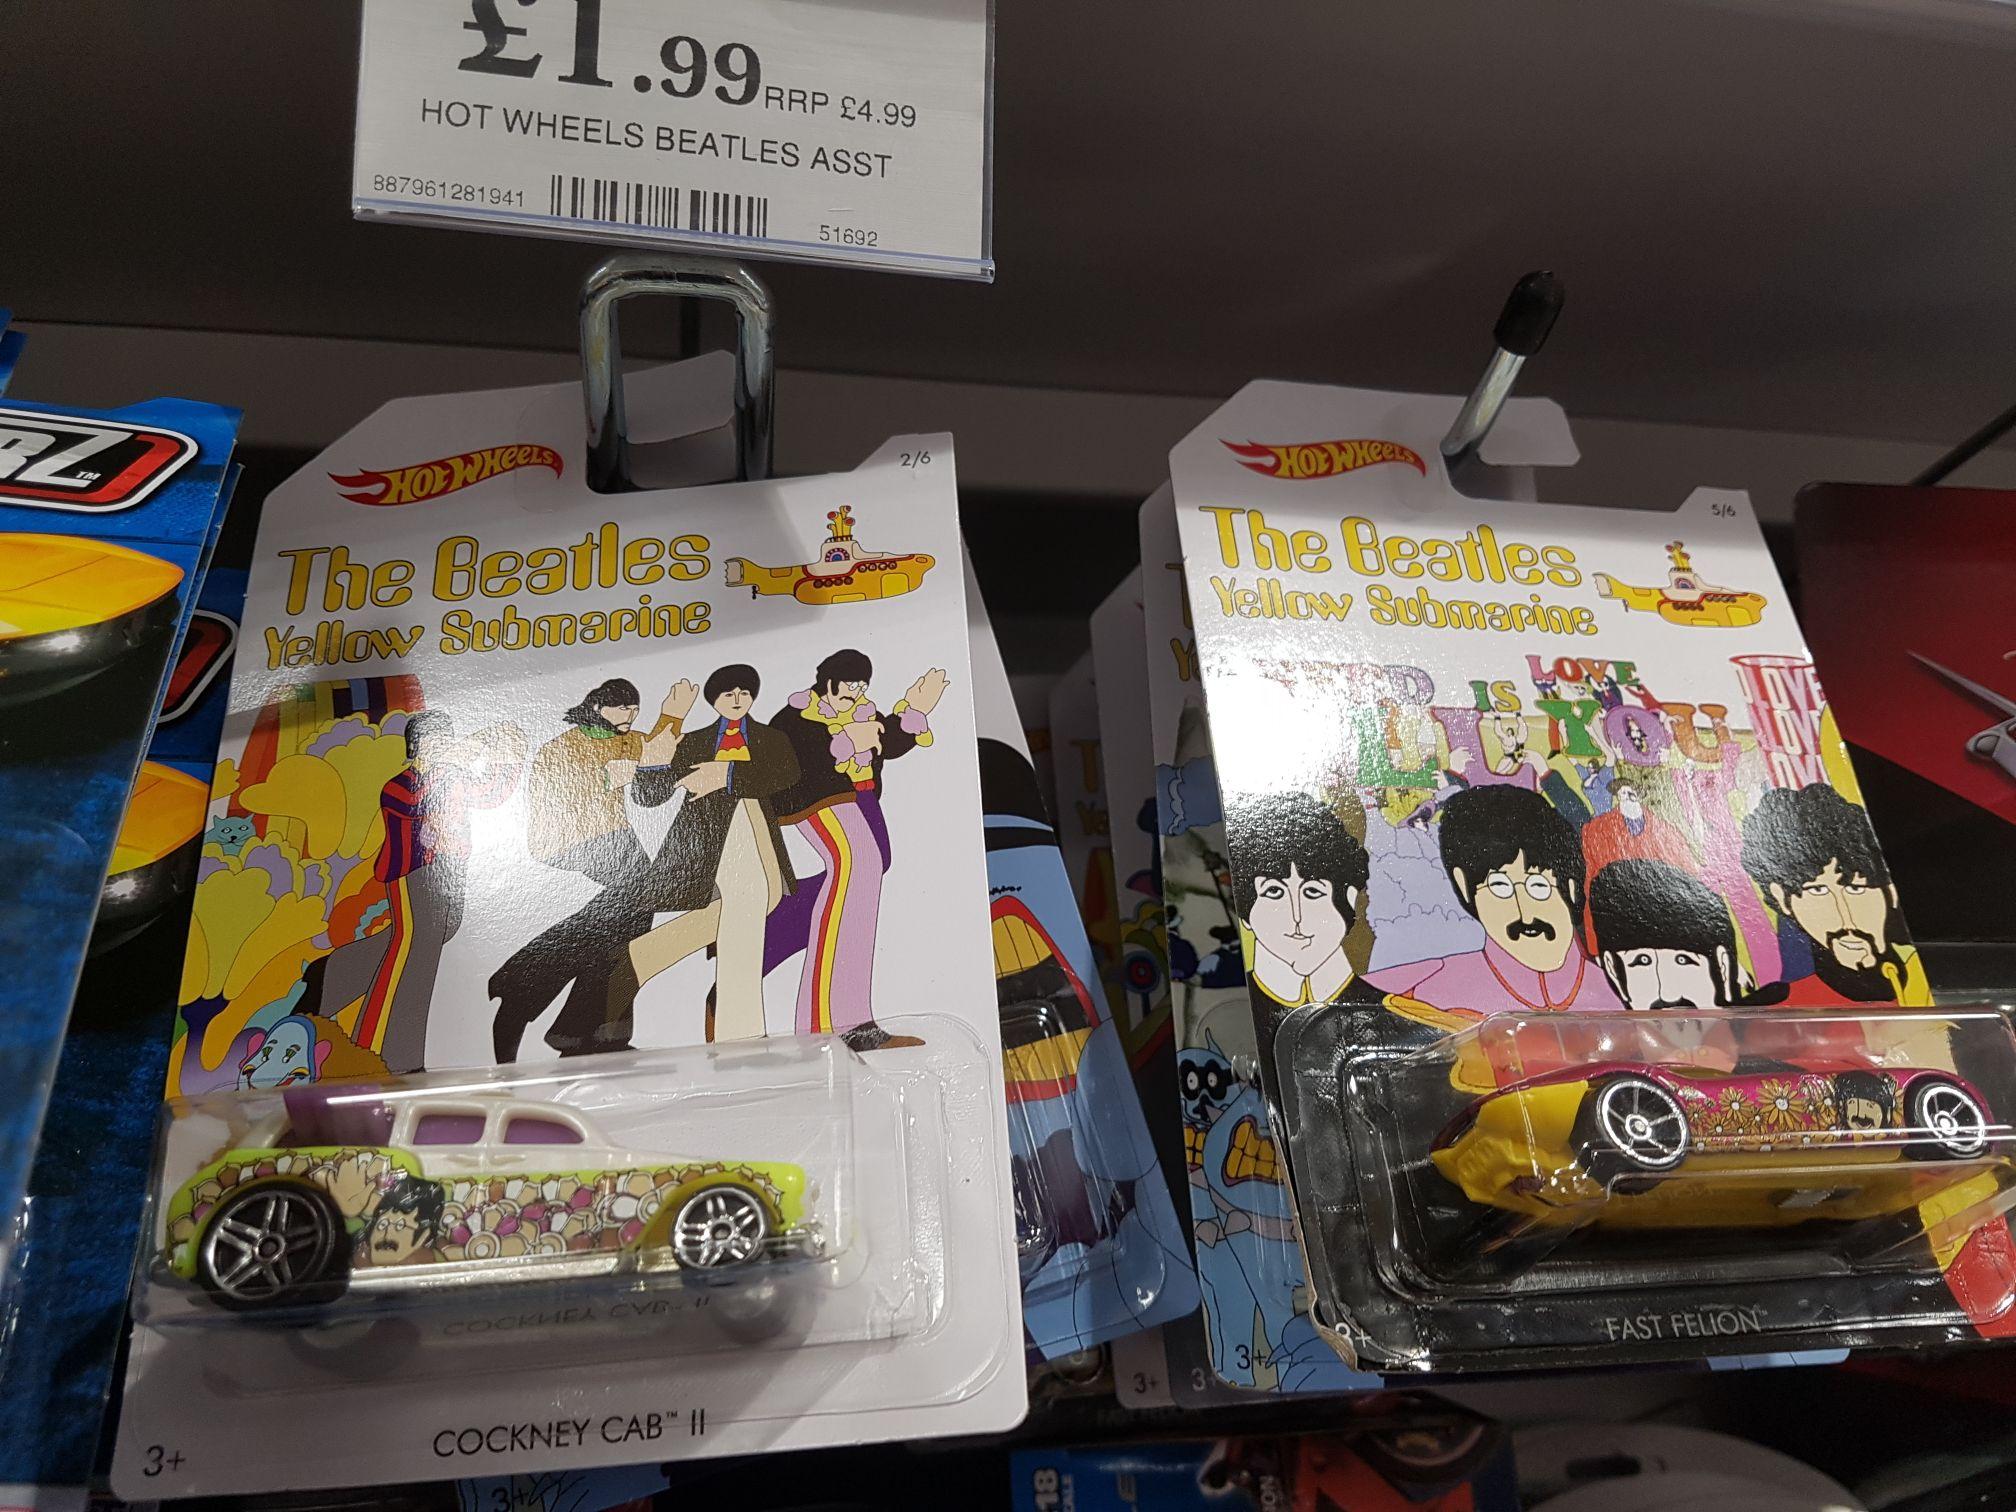 The Beatles hot wheels £1.99 @ home bargains